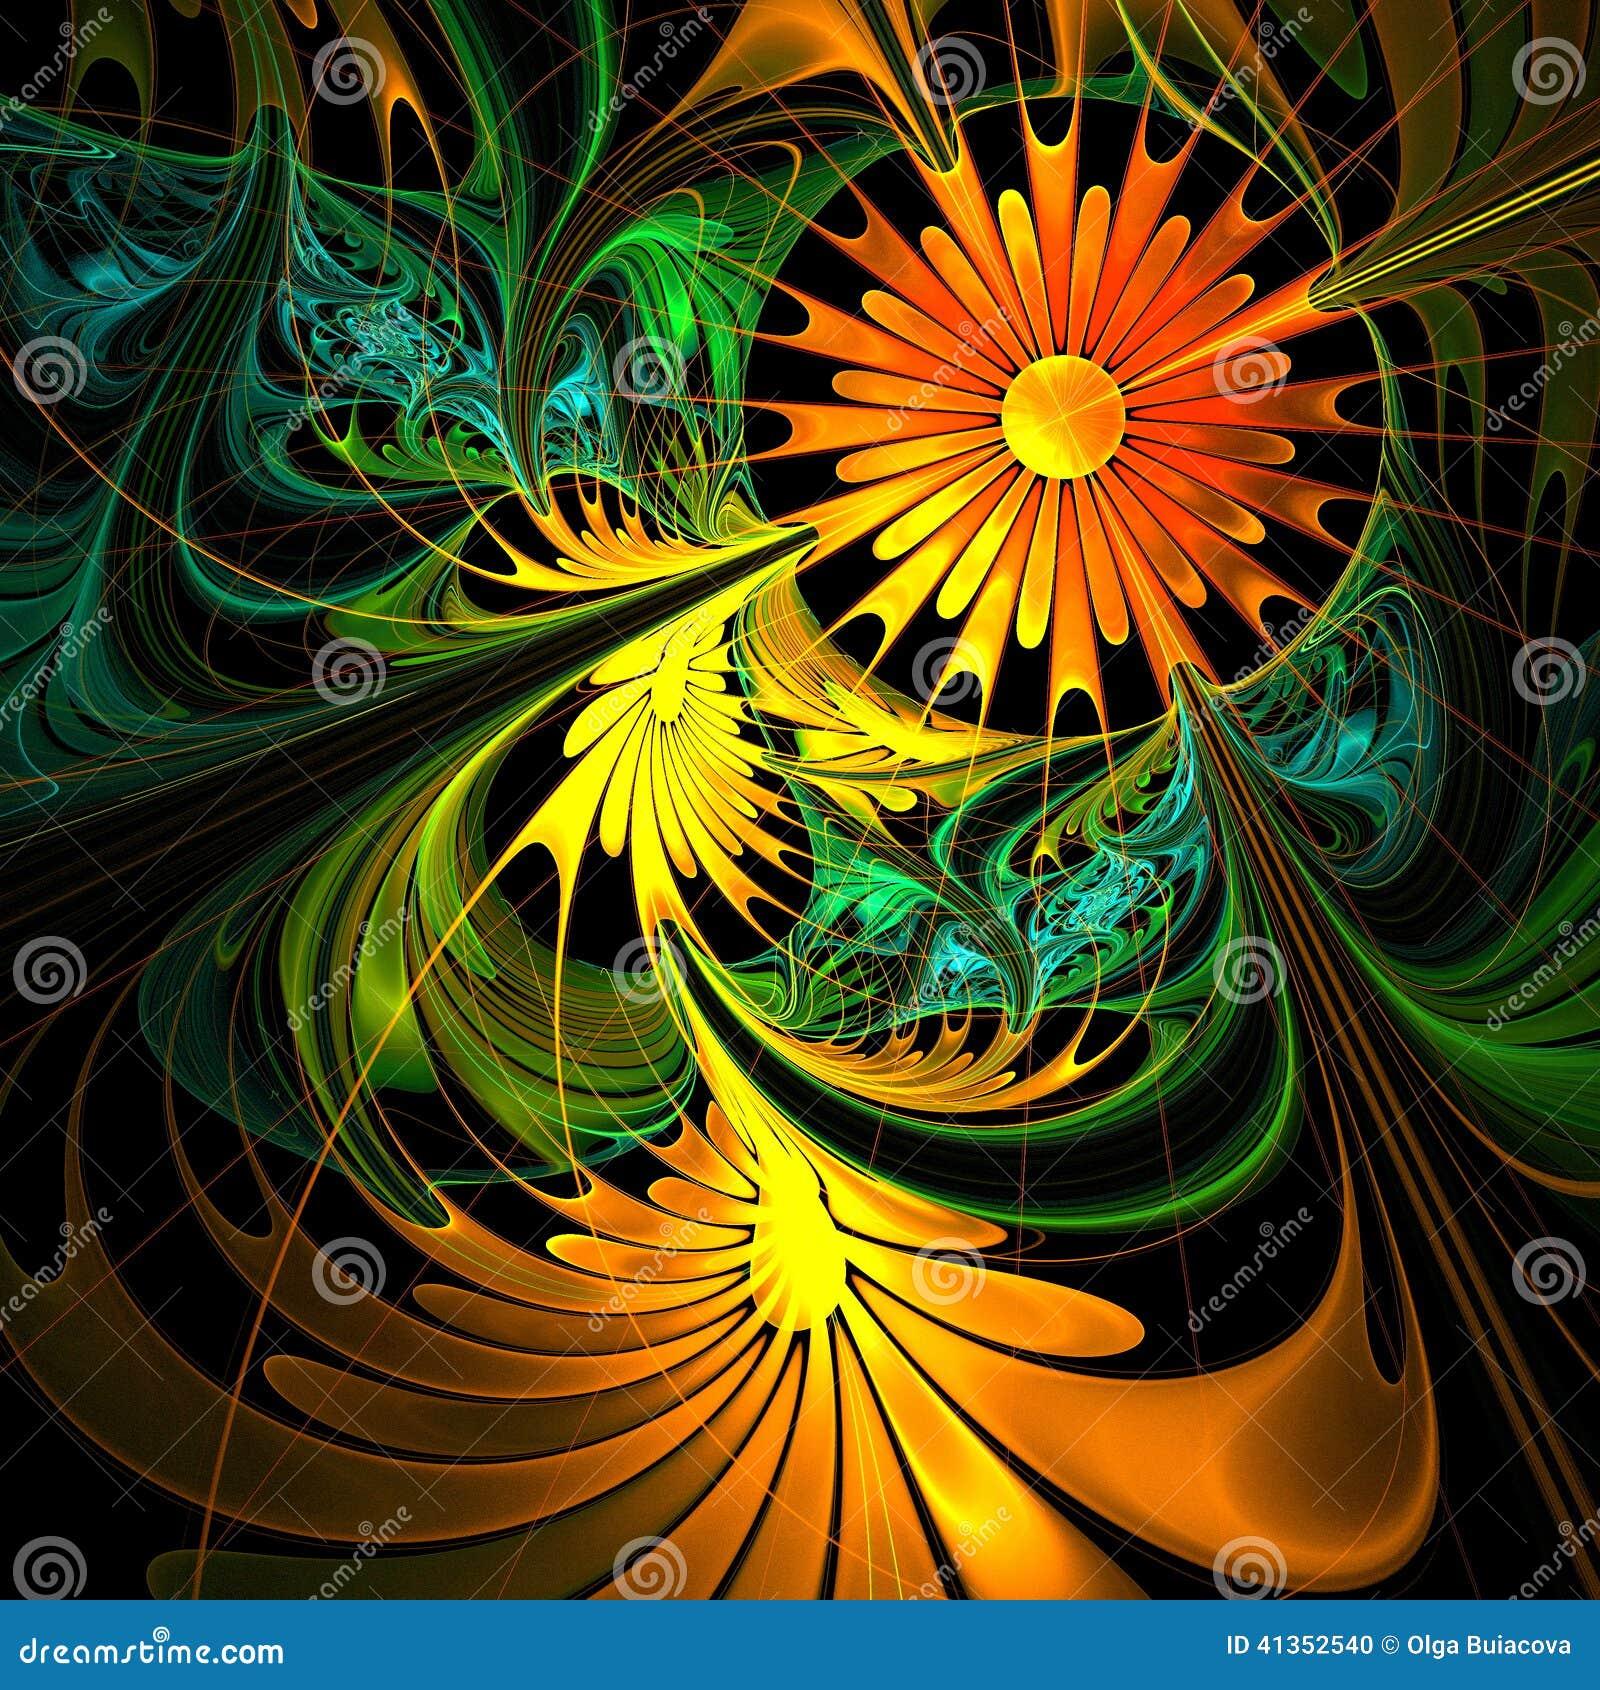 Fractal Black Flower Free Stock Photo: Flower Background. Orange And Green Palette. Stock